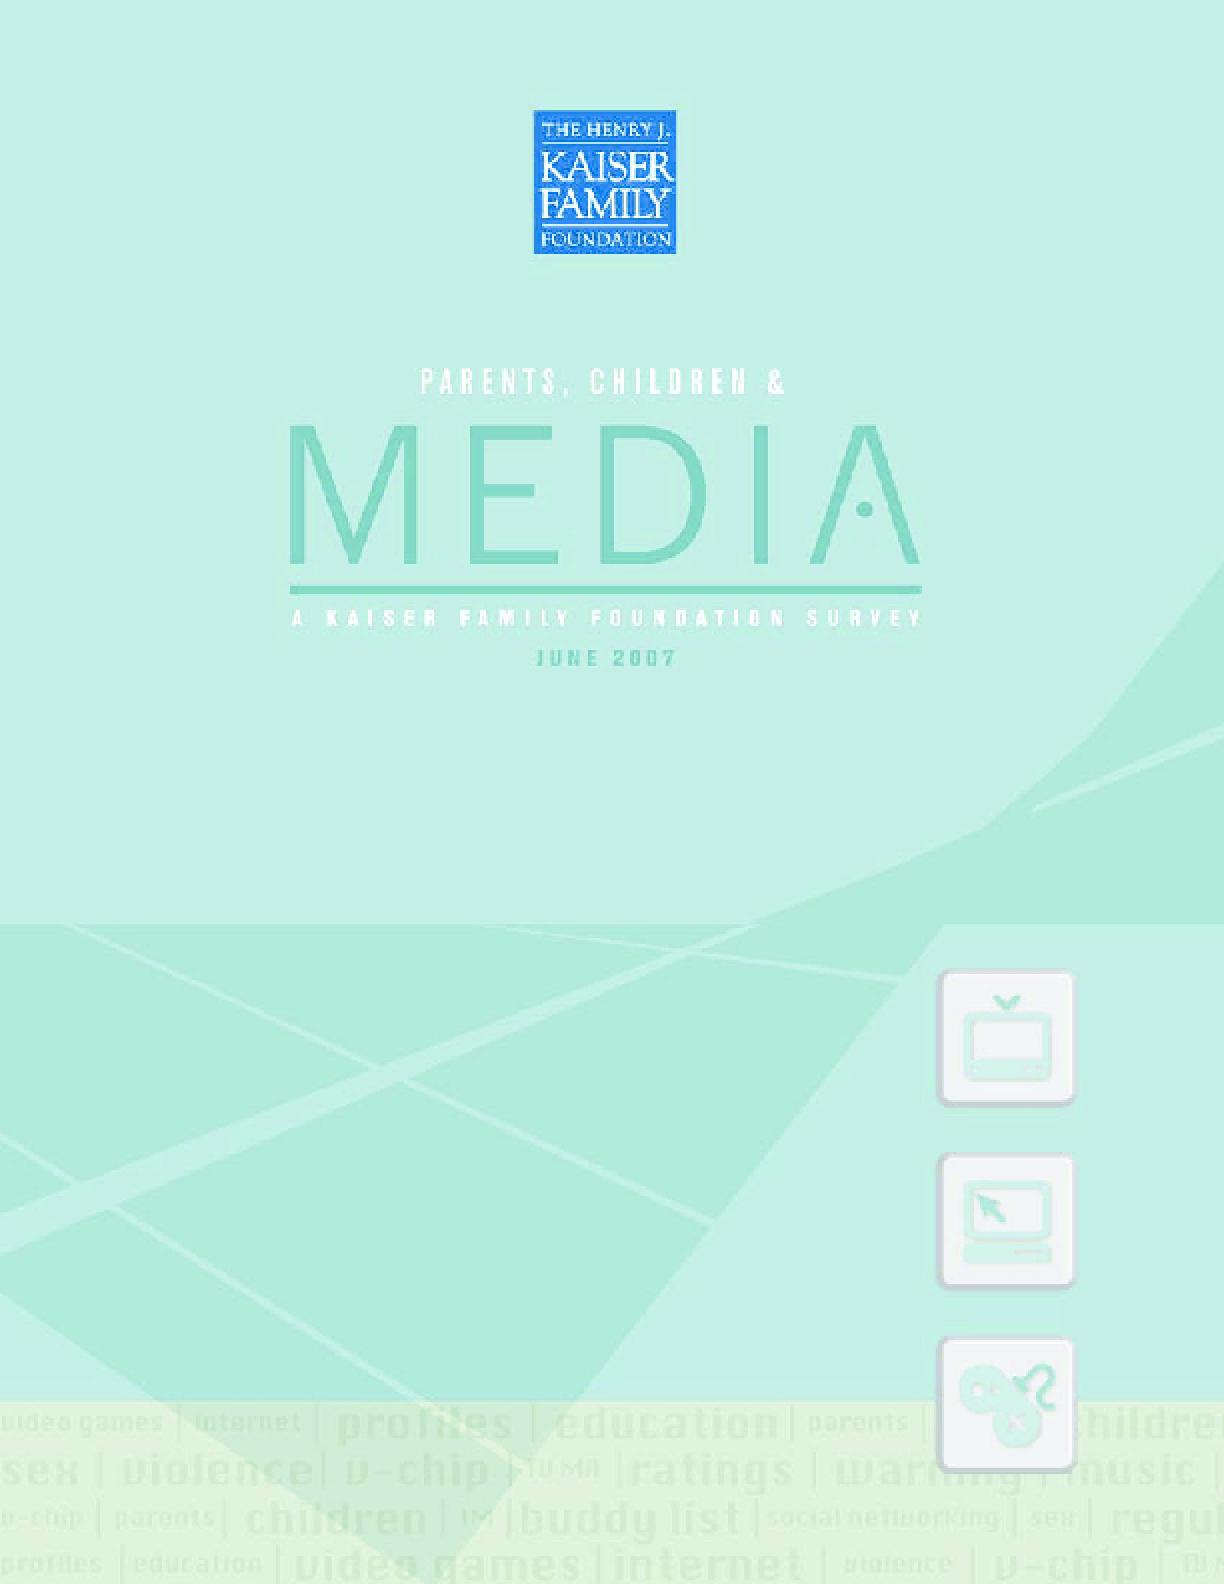 Parents, Children & Media: A Kaiser Family Foundation Survey